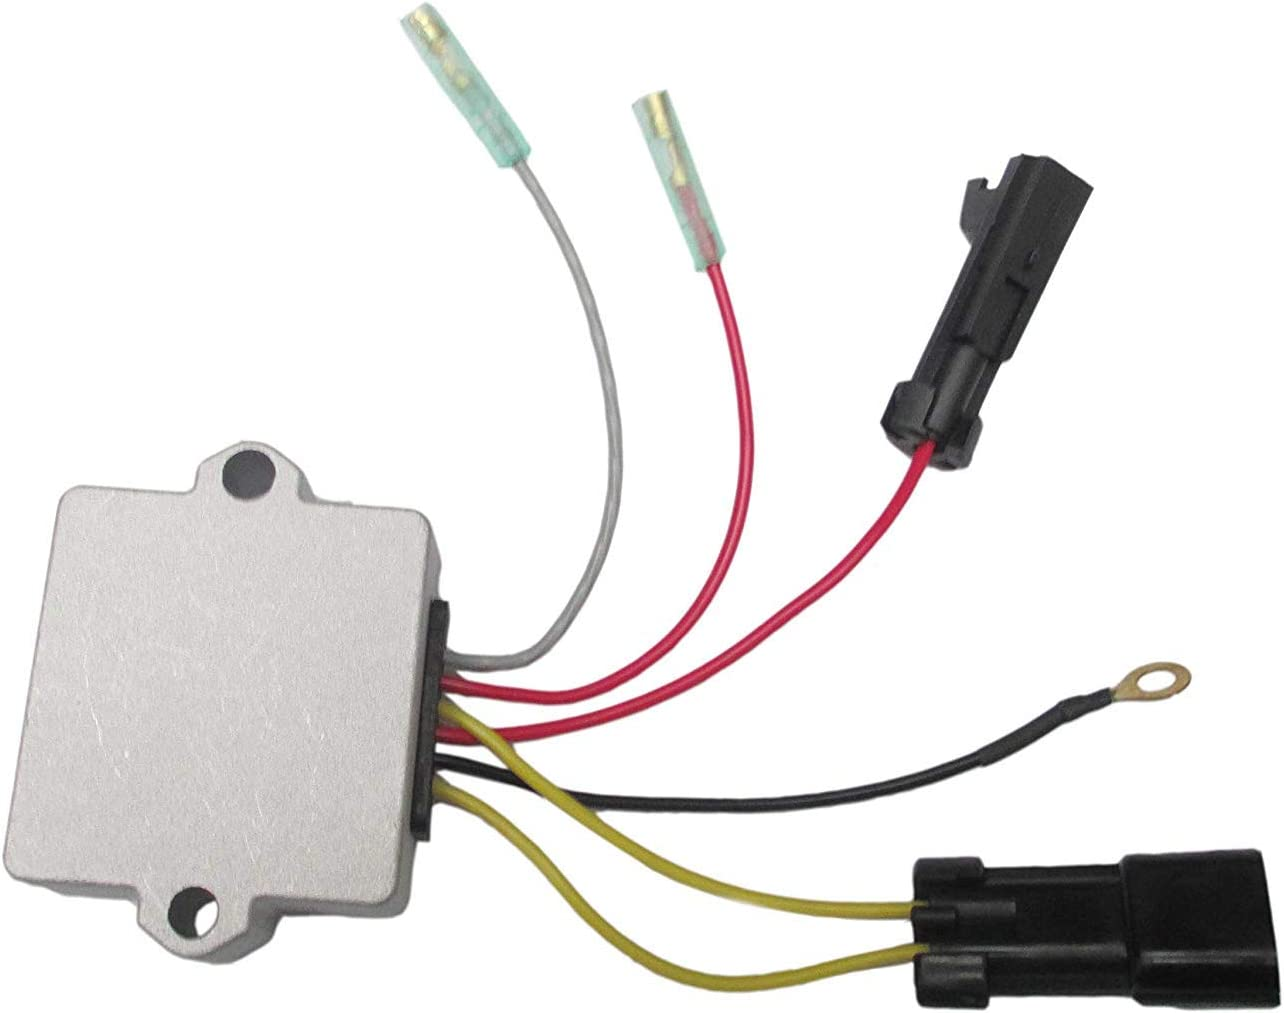 Voltage Regulator Rectifier for Mercury 194-3072K1 6 Wire Mail order Ultra-Cheap Deals cheap 854515